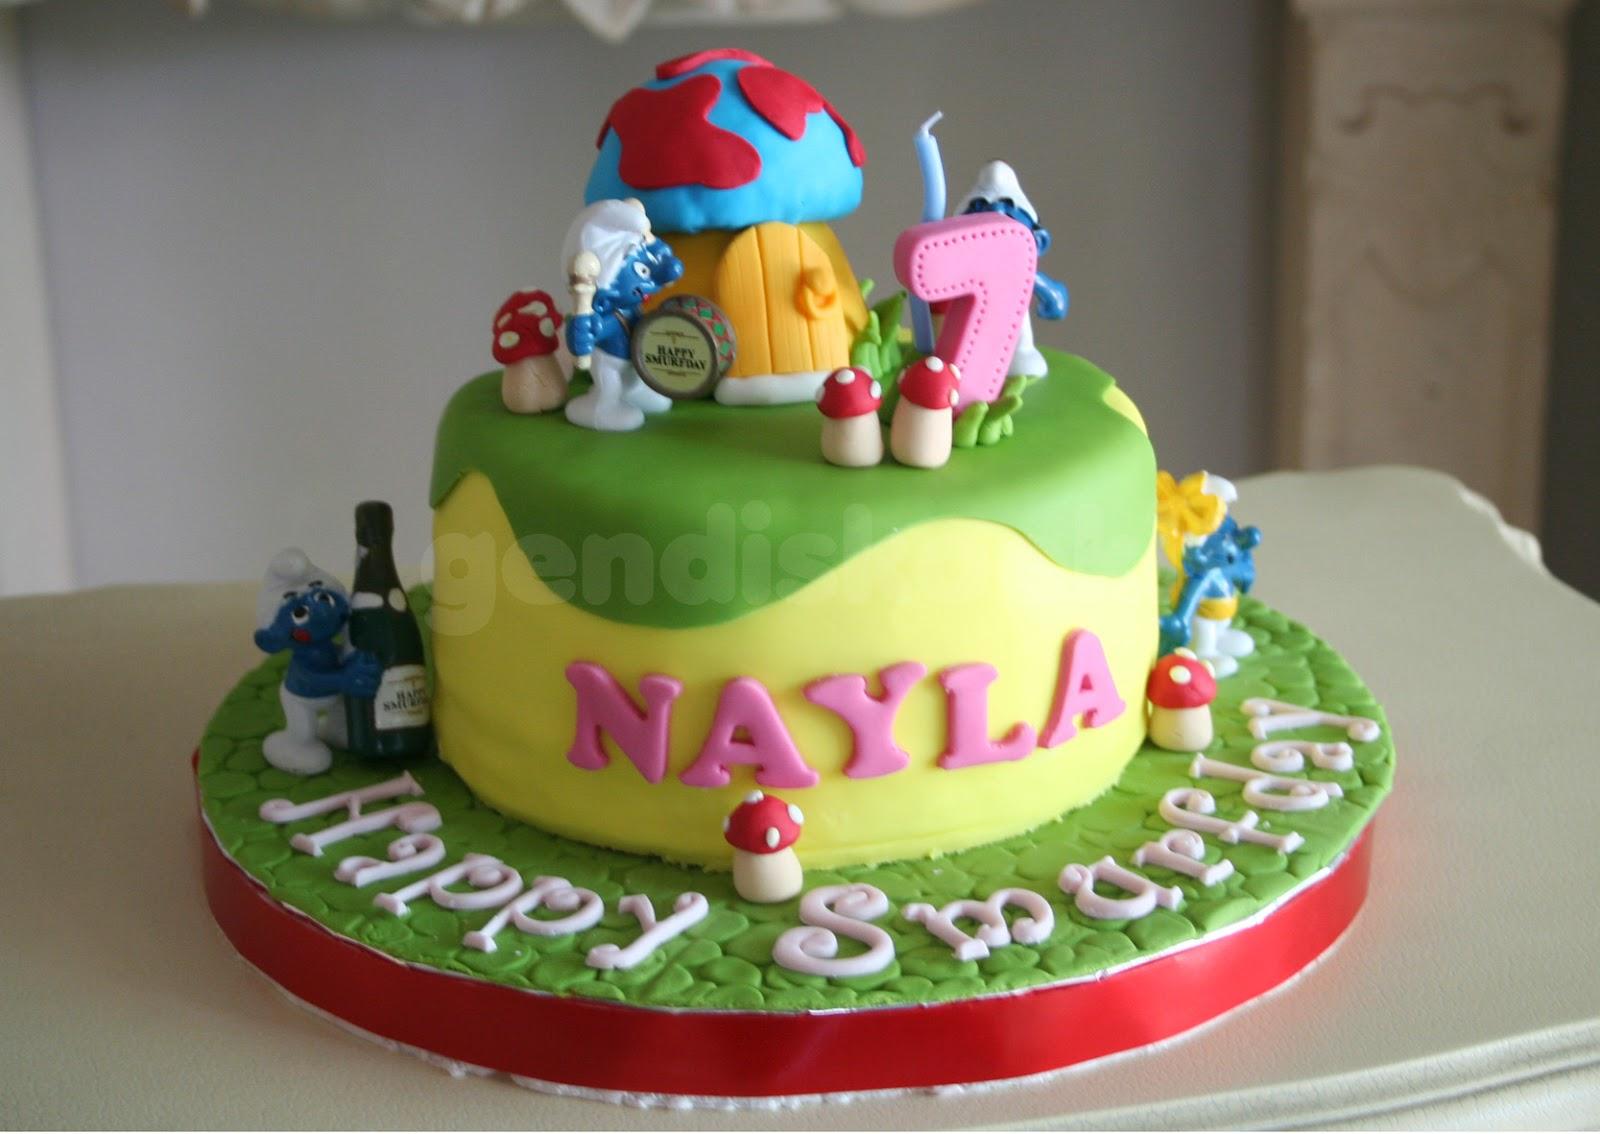 Gendiskoekis Smurf Birthday Cake